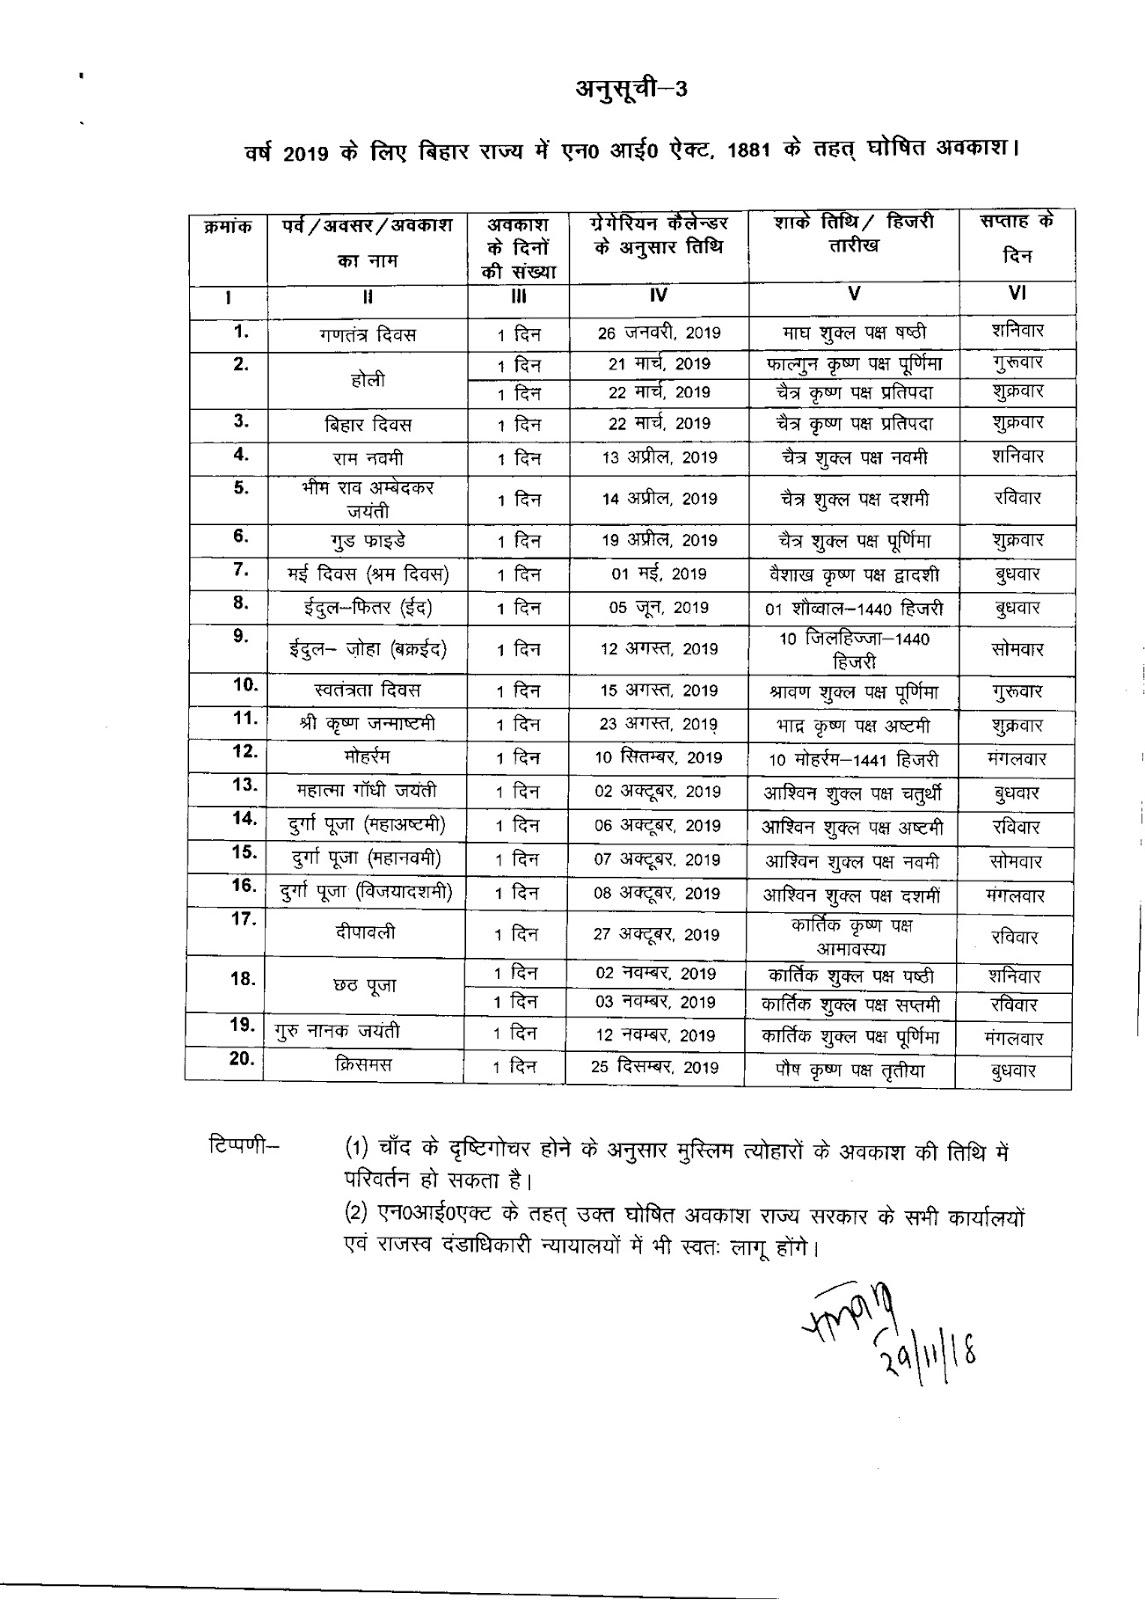 Bihar Government Calendar 2019 #educratsweb regarding Bihar Government Calender 2020